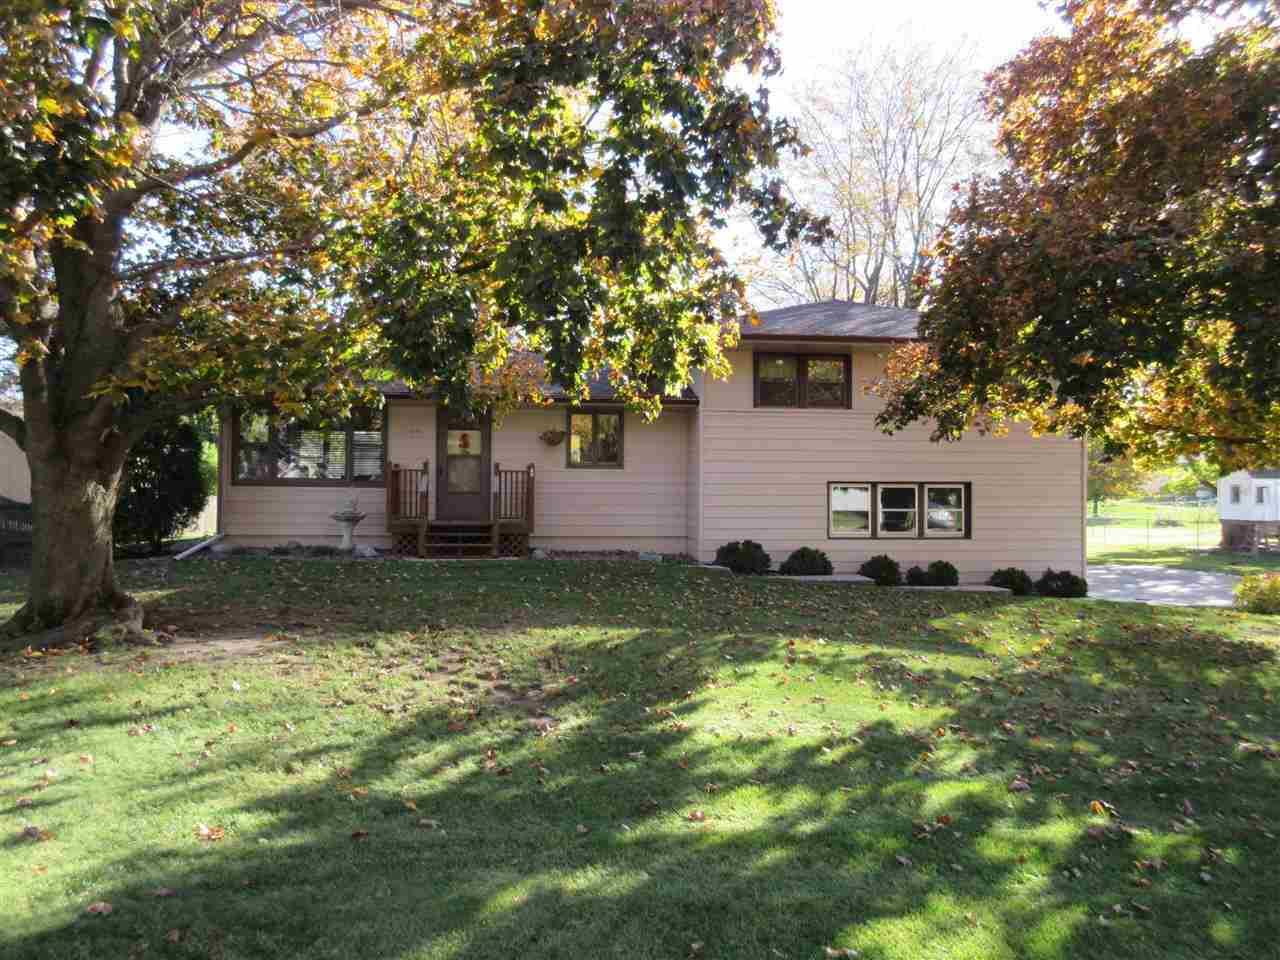 Real Estate for Sale, ListingId: 30290982, Orion,IL61273